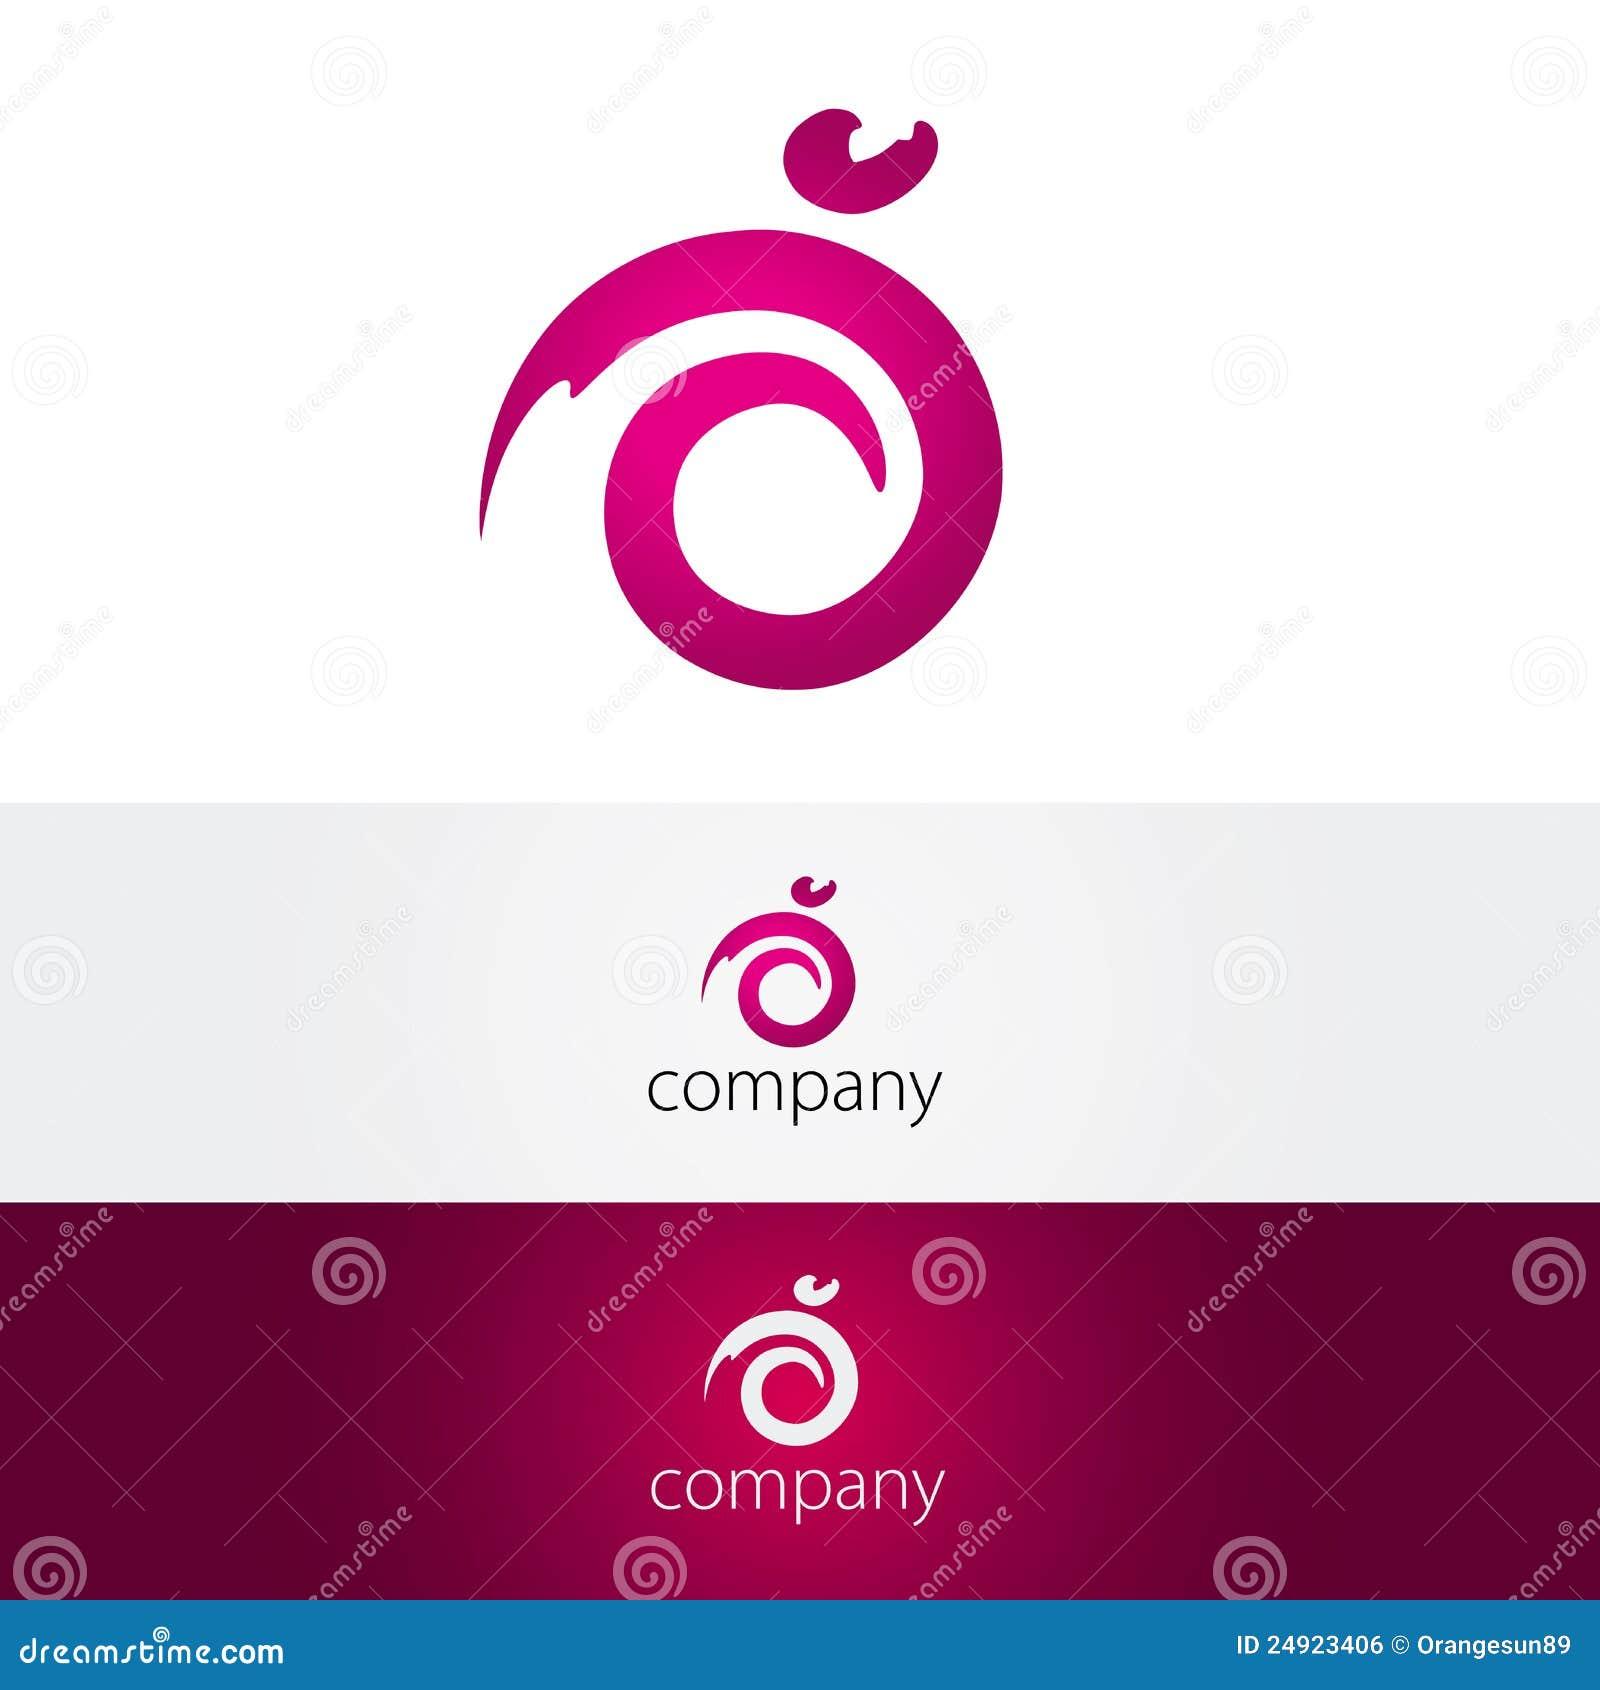 jewelry ring logo illustration 24923406 megapixl megapixl